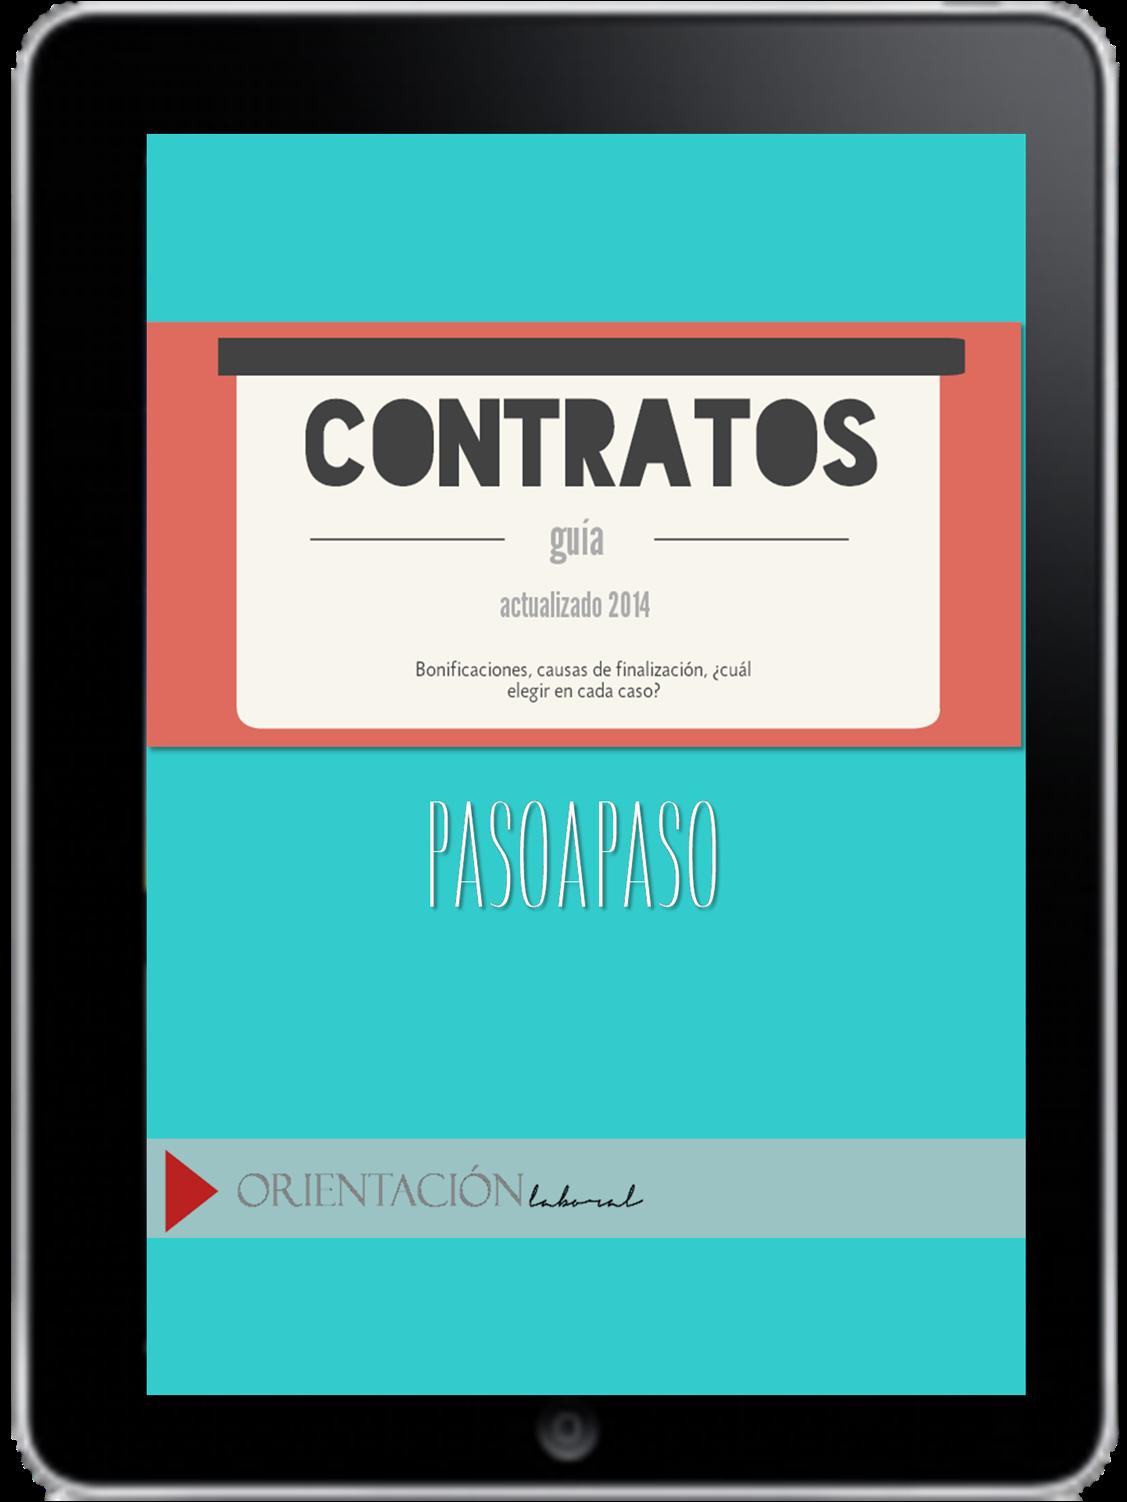 manual contratos 2014